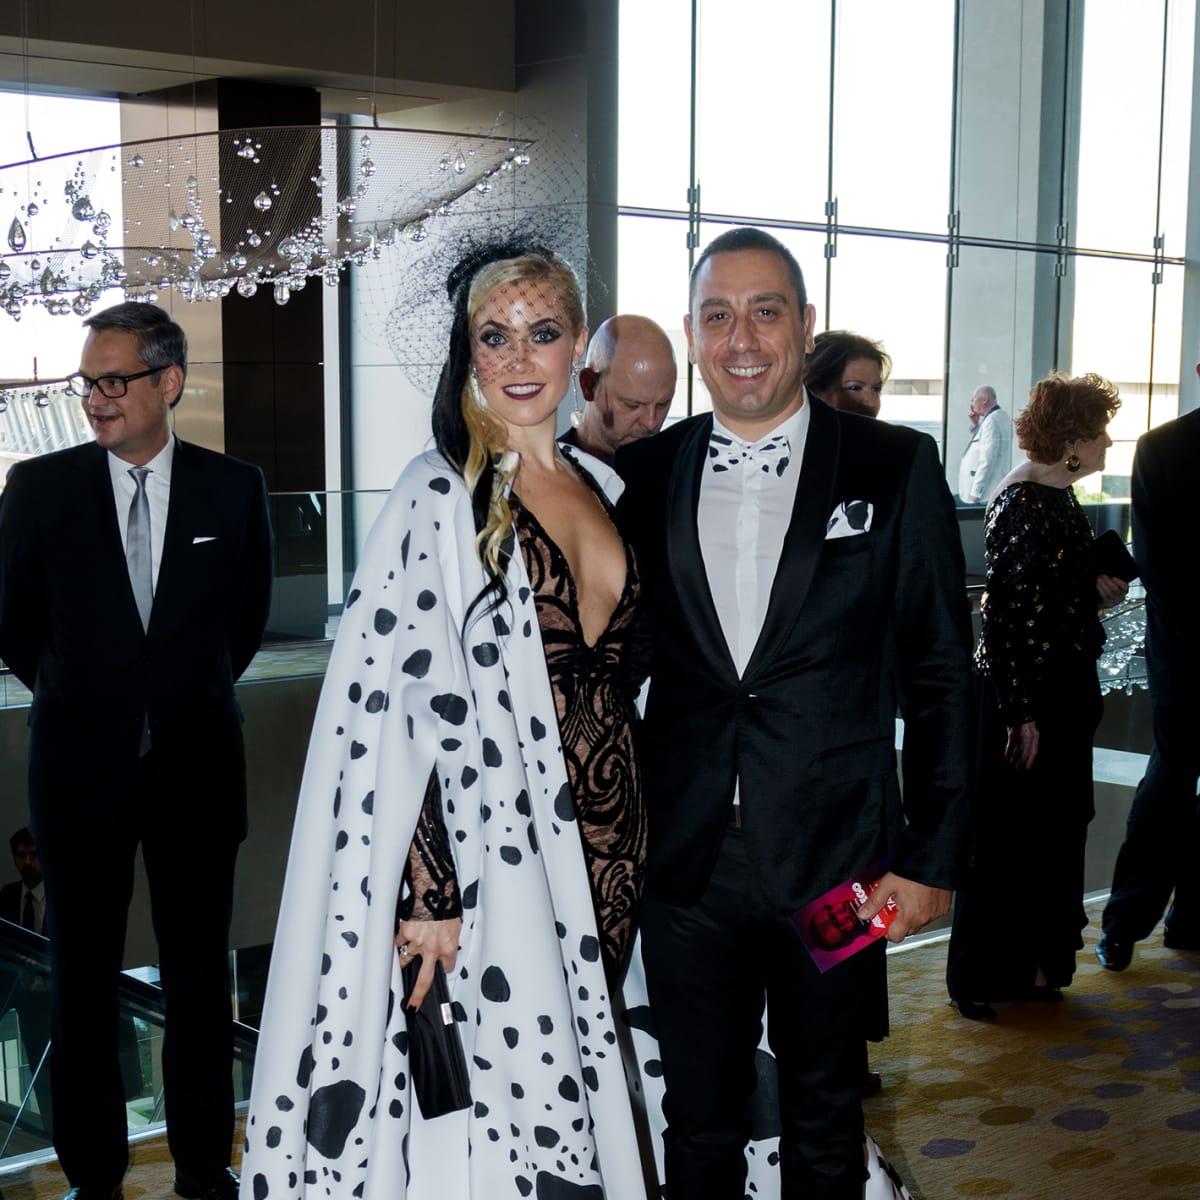 Norah Meier, Steven Maroulis at House of DIFFA 2018